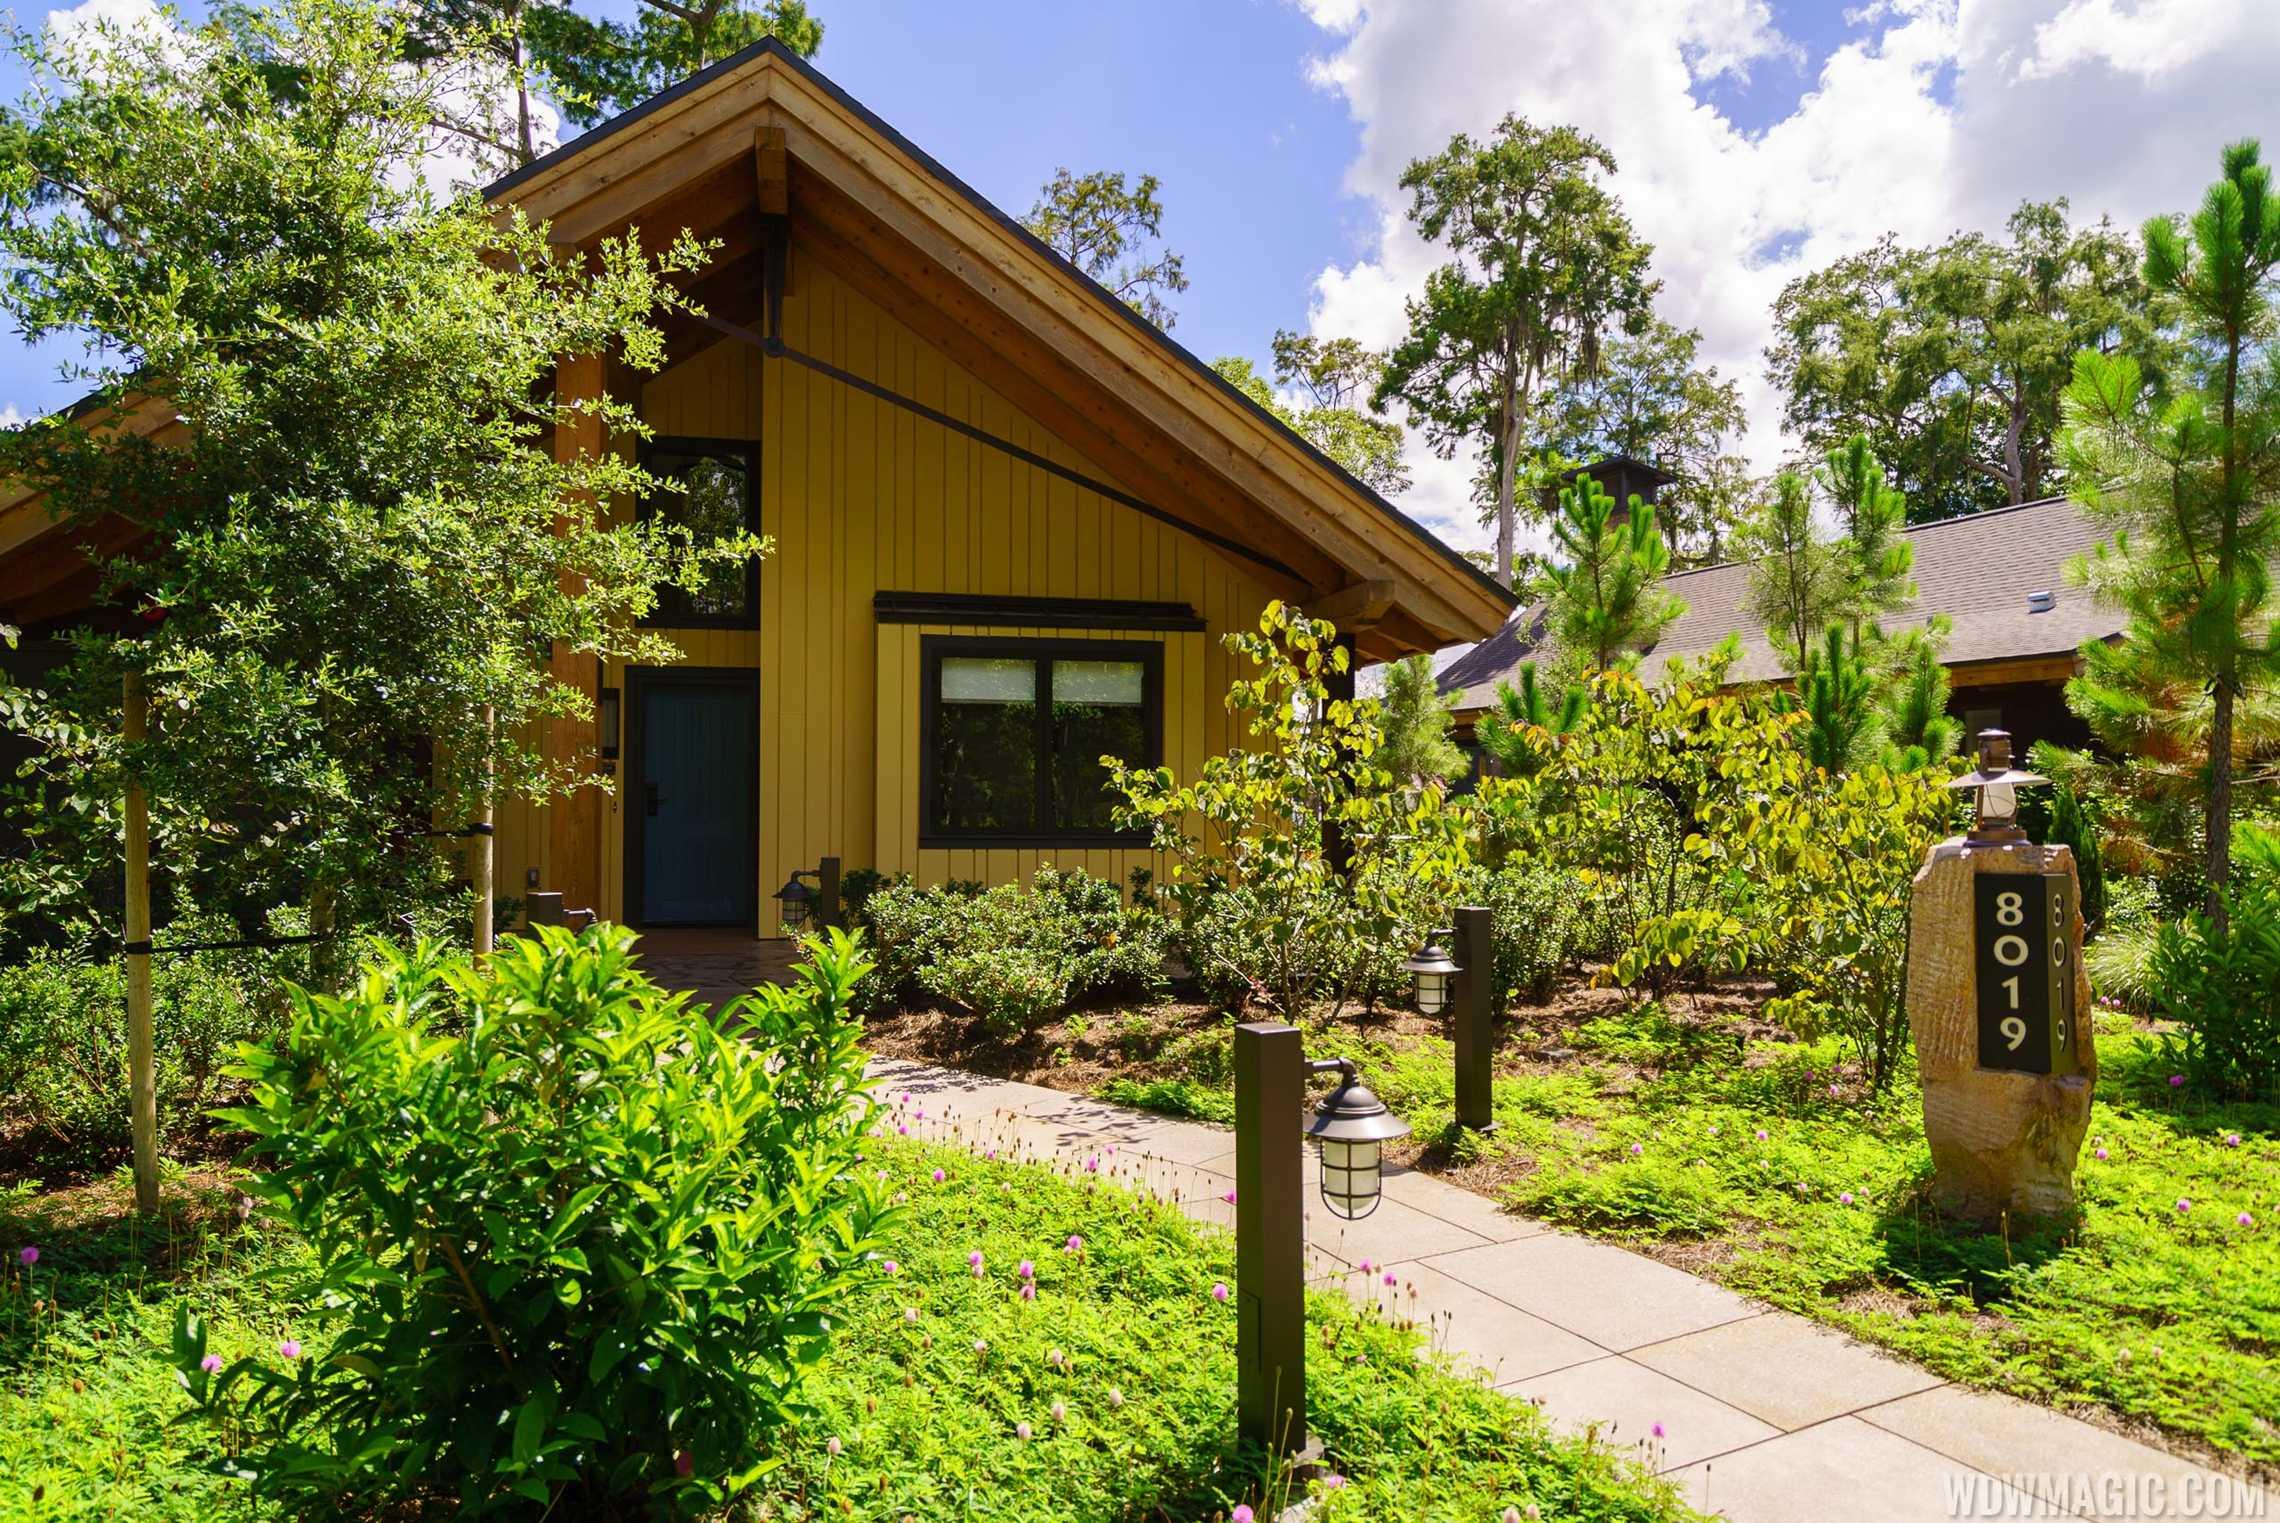 Copper Creek Villas and Cabins at Disney's Wilderness Lodge - Cabin Exterior